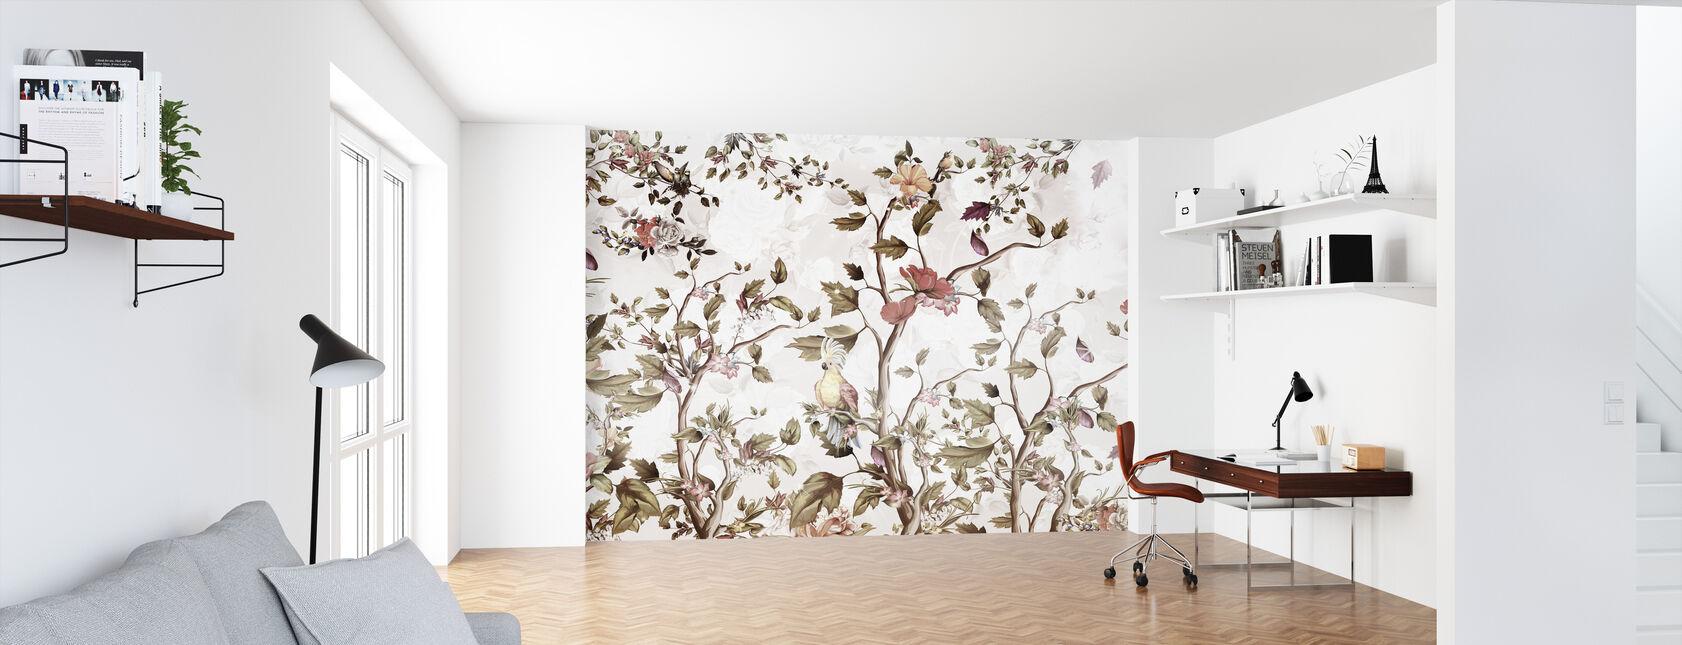 Parrot in Blossom - Wallpaper - Office